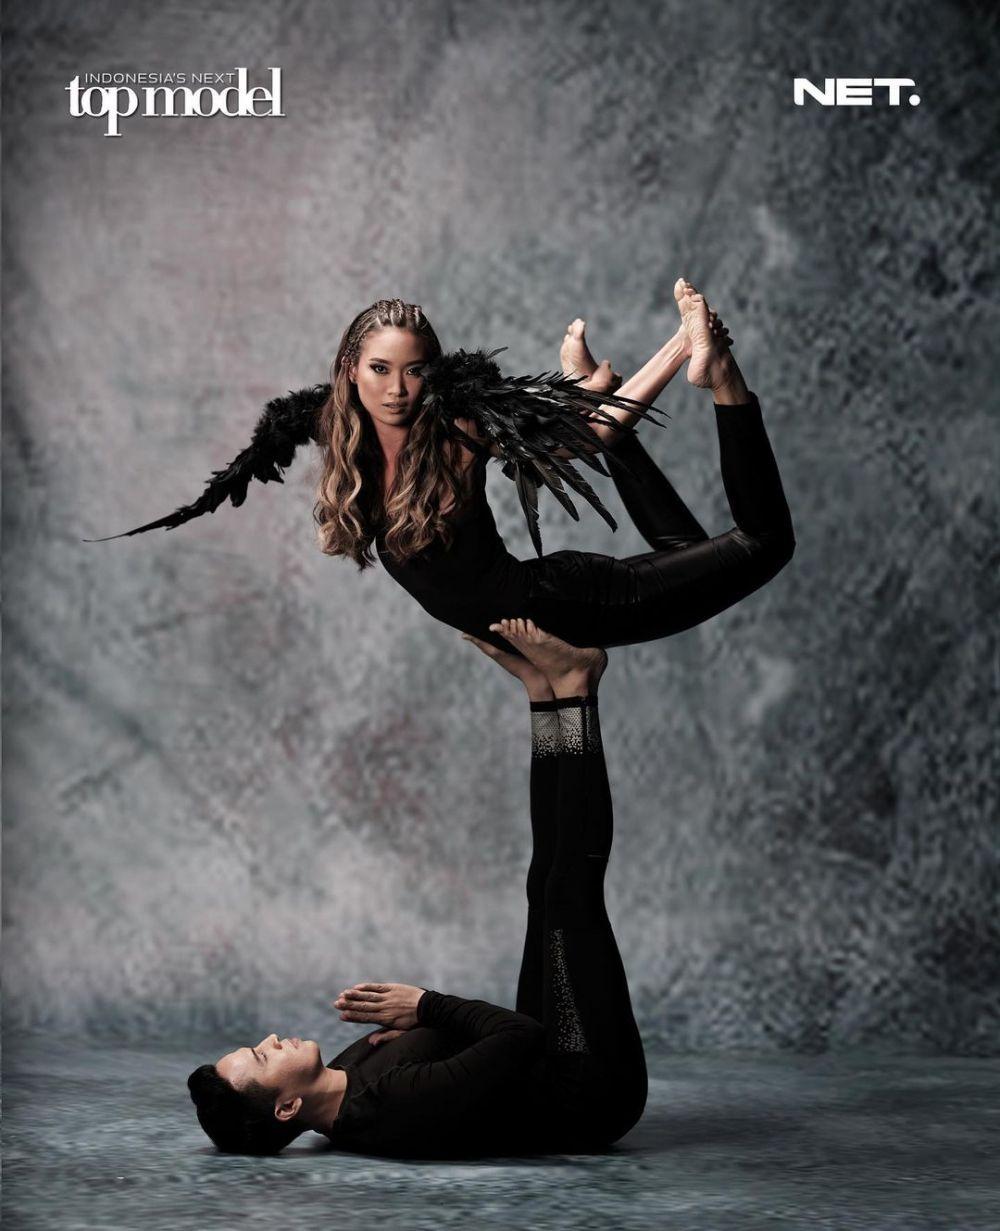 9 Potret Fotogenik Danella Ilene, Pemenang INTM yang Super Stunning